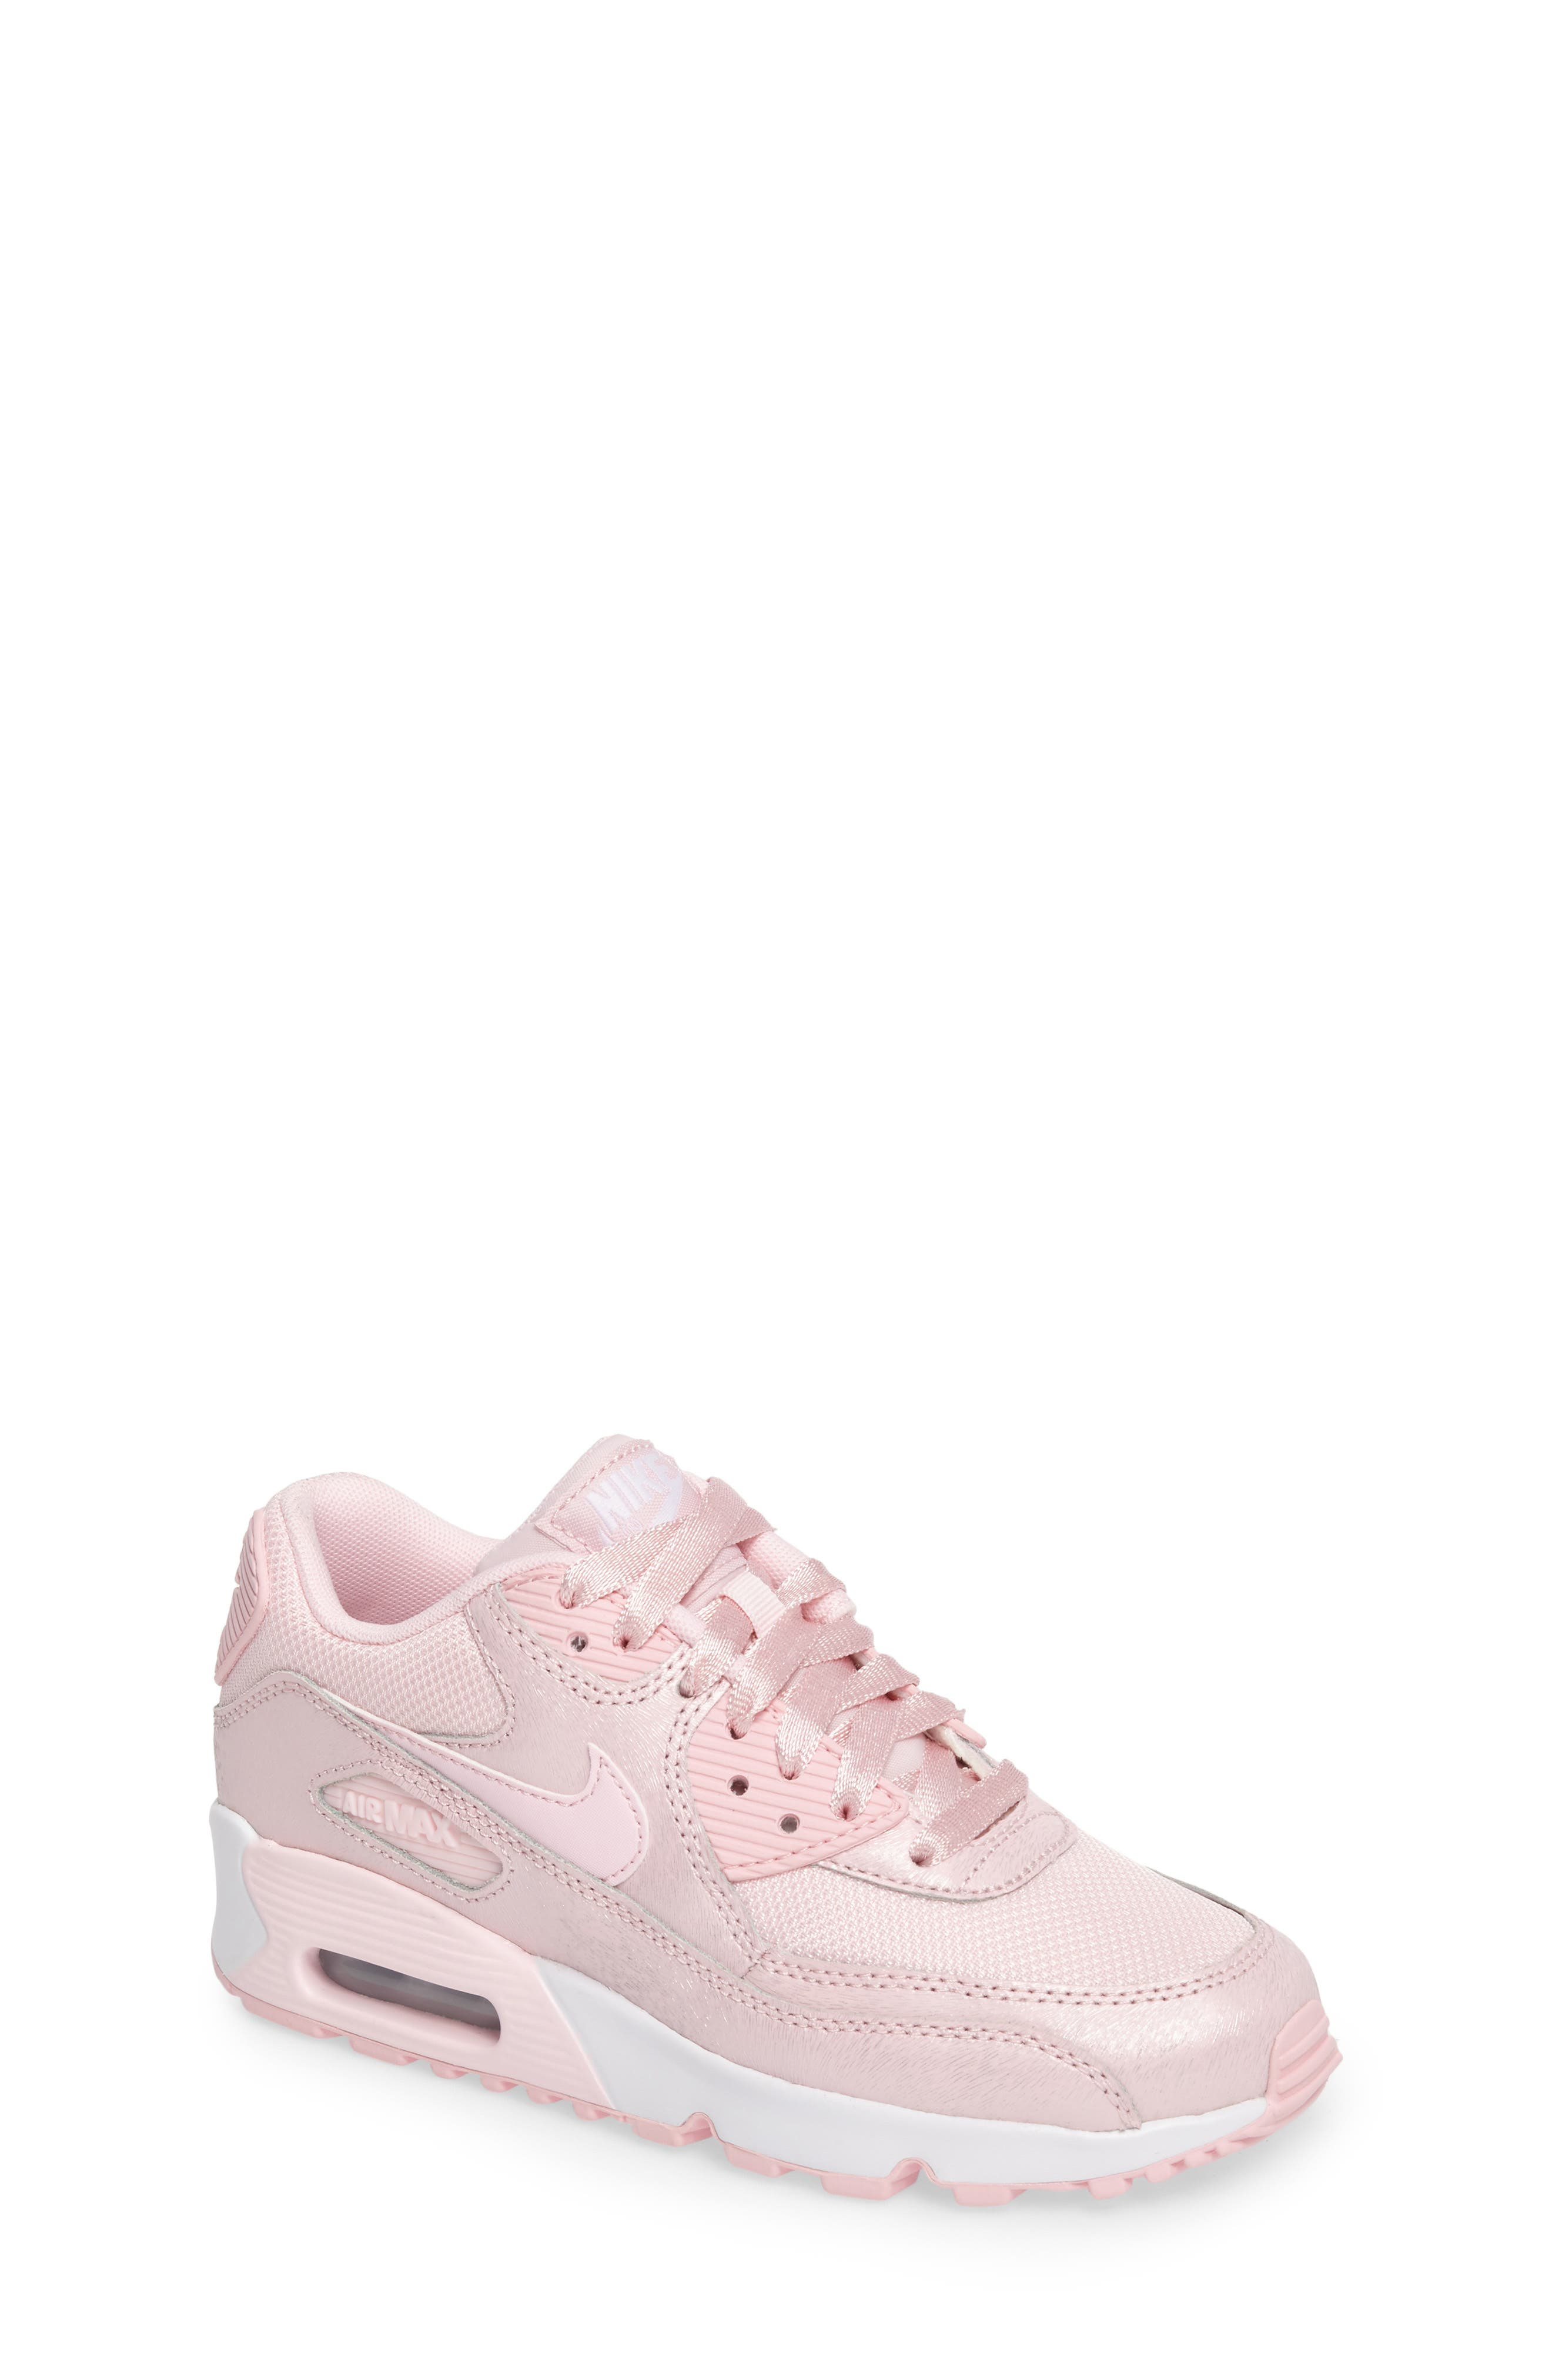 Air Max 90 Mesh Sneaker,                             Main thumbnail 1, color,                             Prism Pink/ White